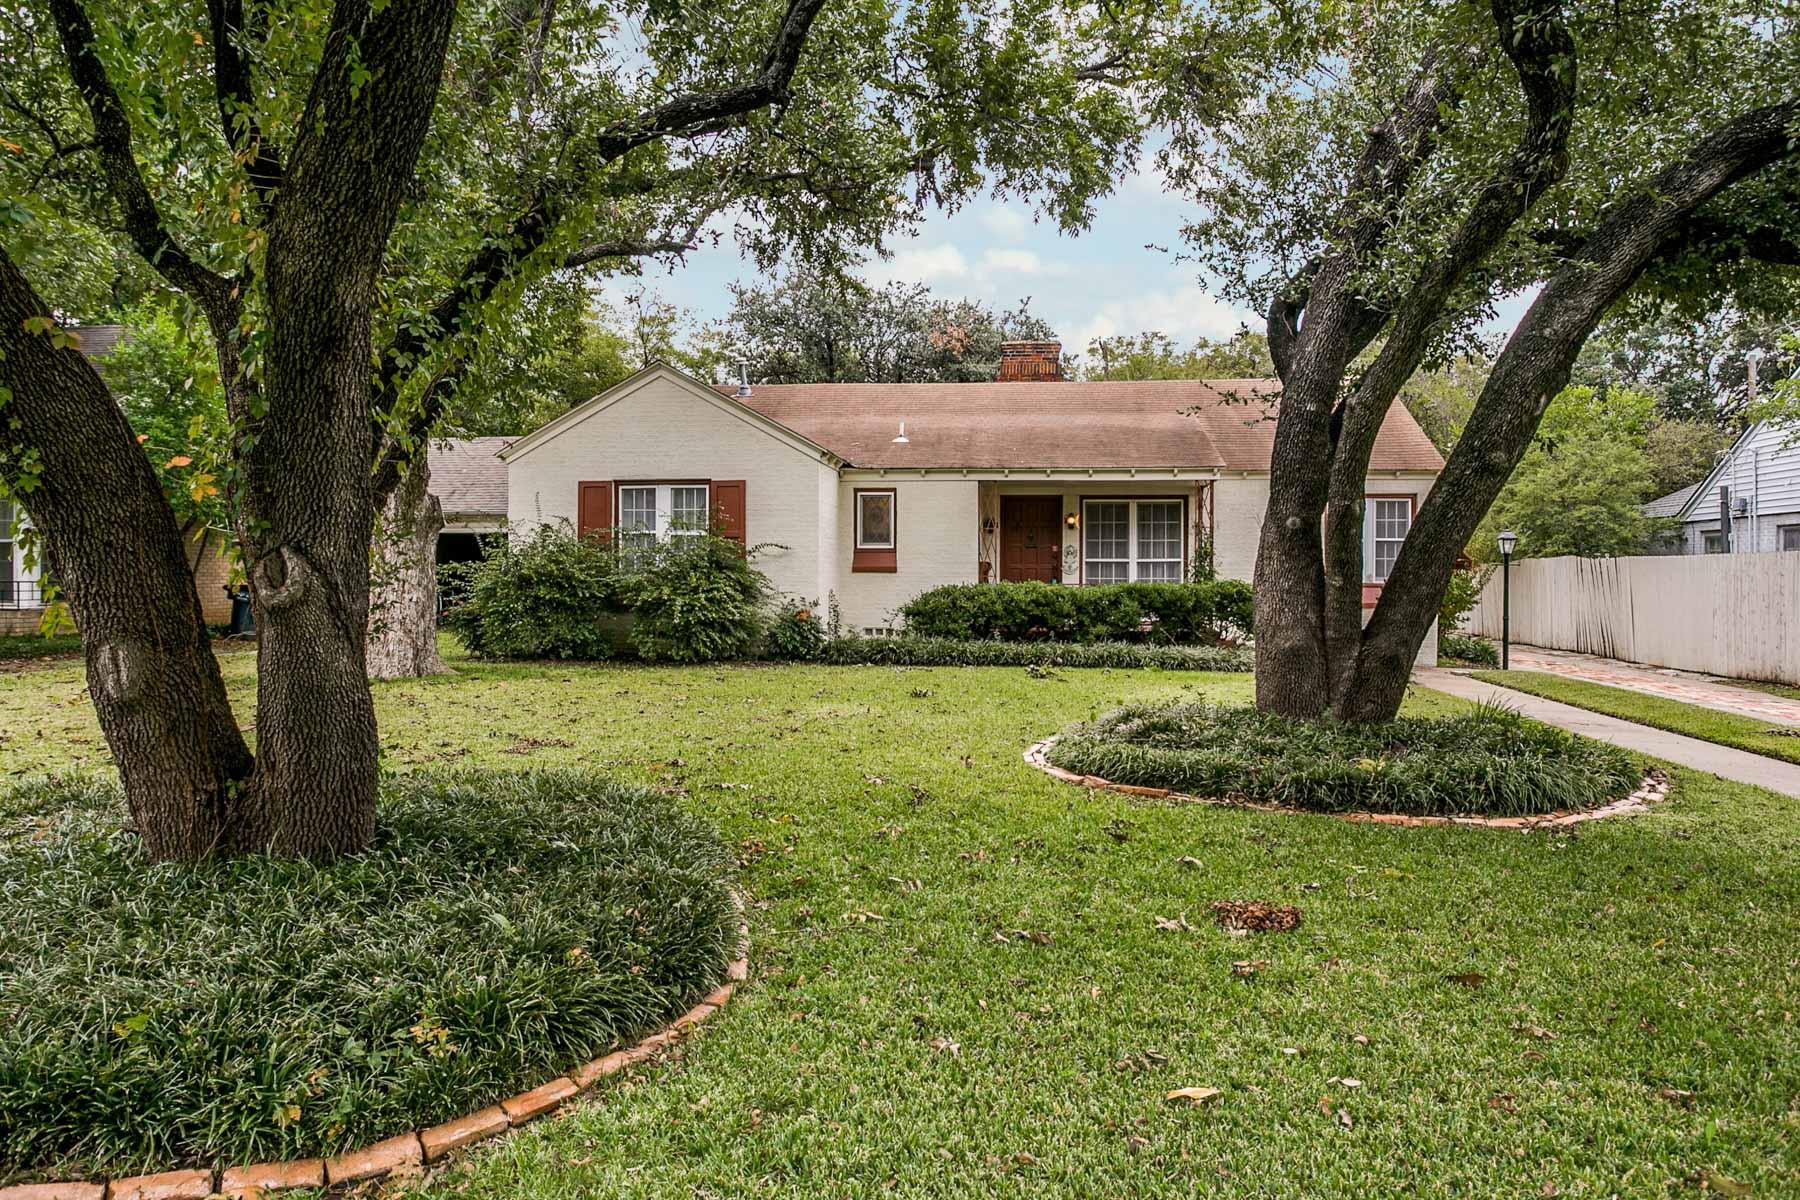 独户住宅 为 销售 在 Cottage Chic Home 3743 Westcliff Road Fort Worth, 得克萨斯州 76109 美国